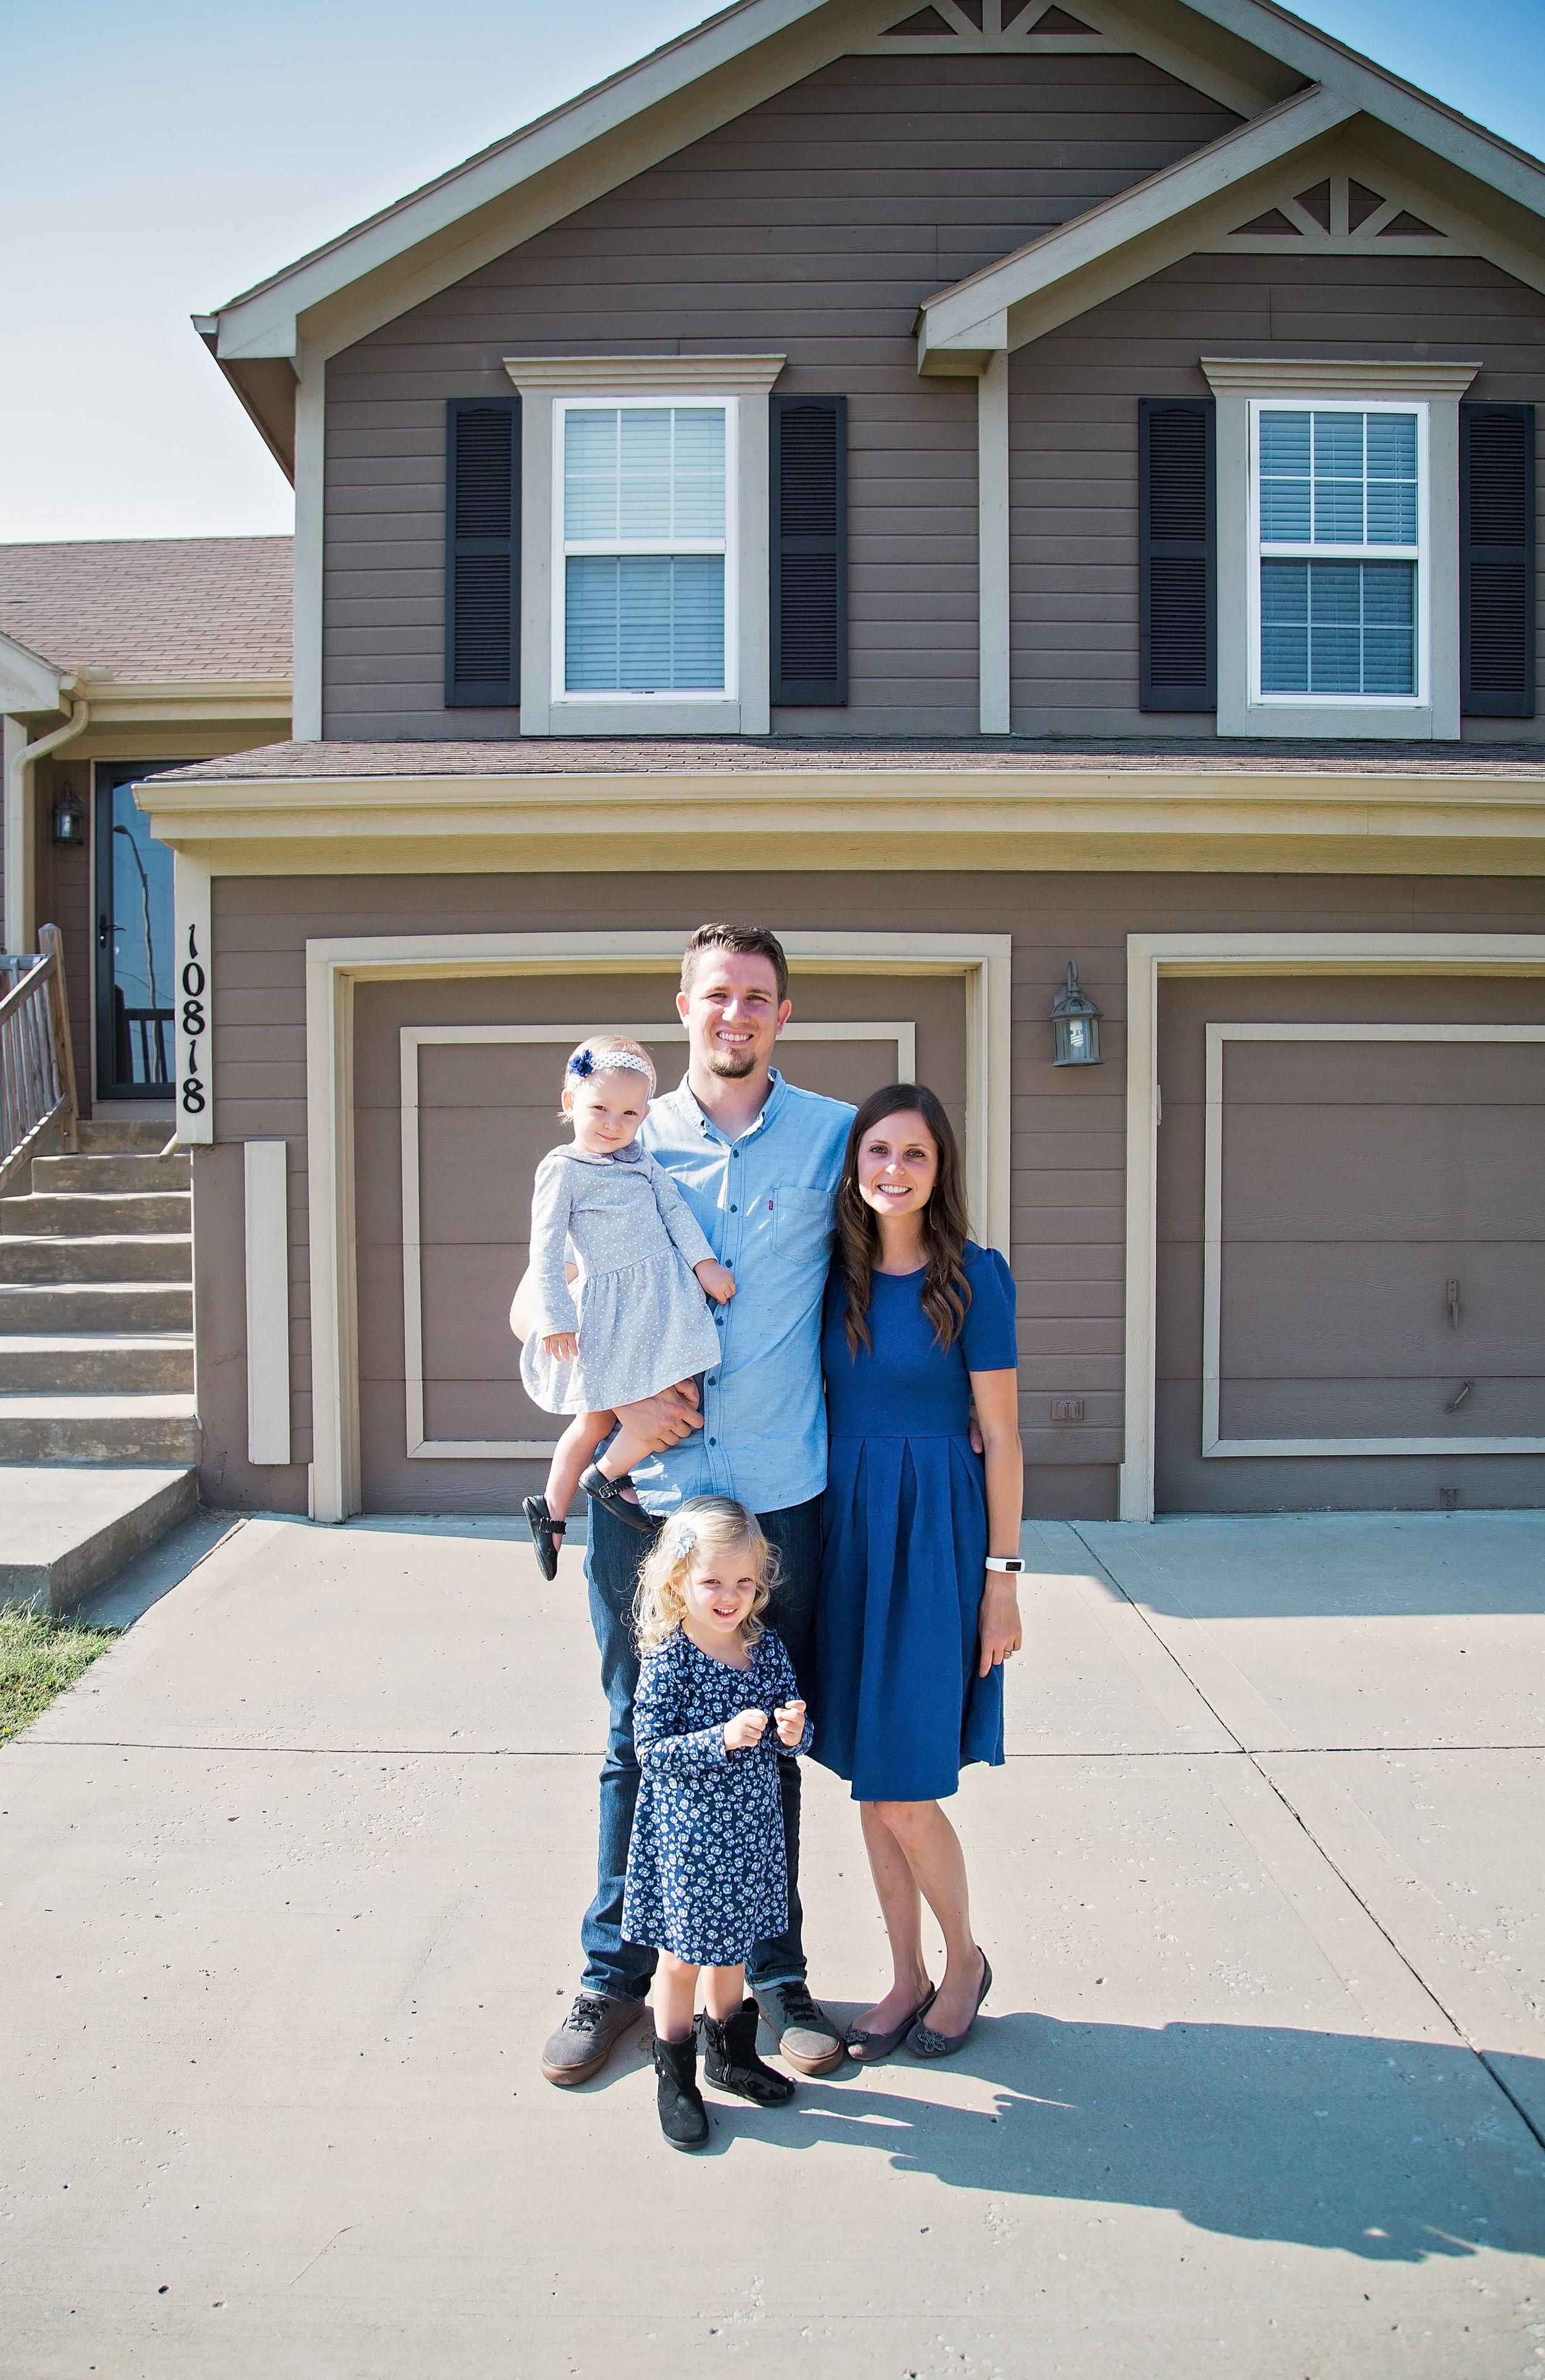 Mackeys Adoption Report Photos-0006.jpg